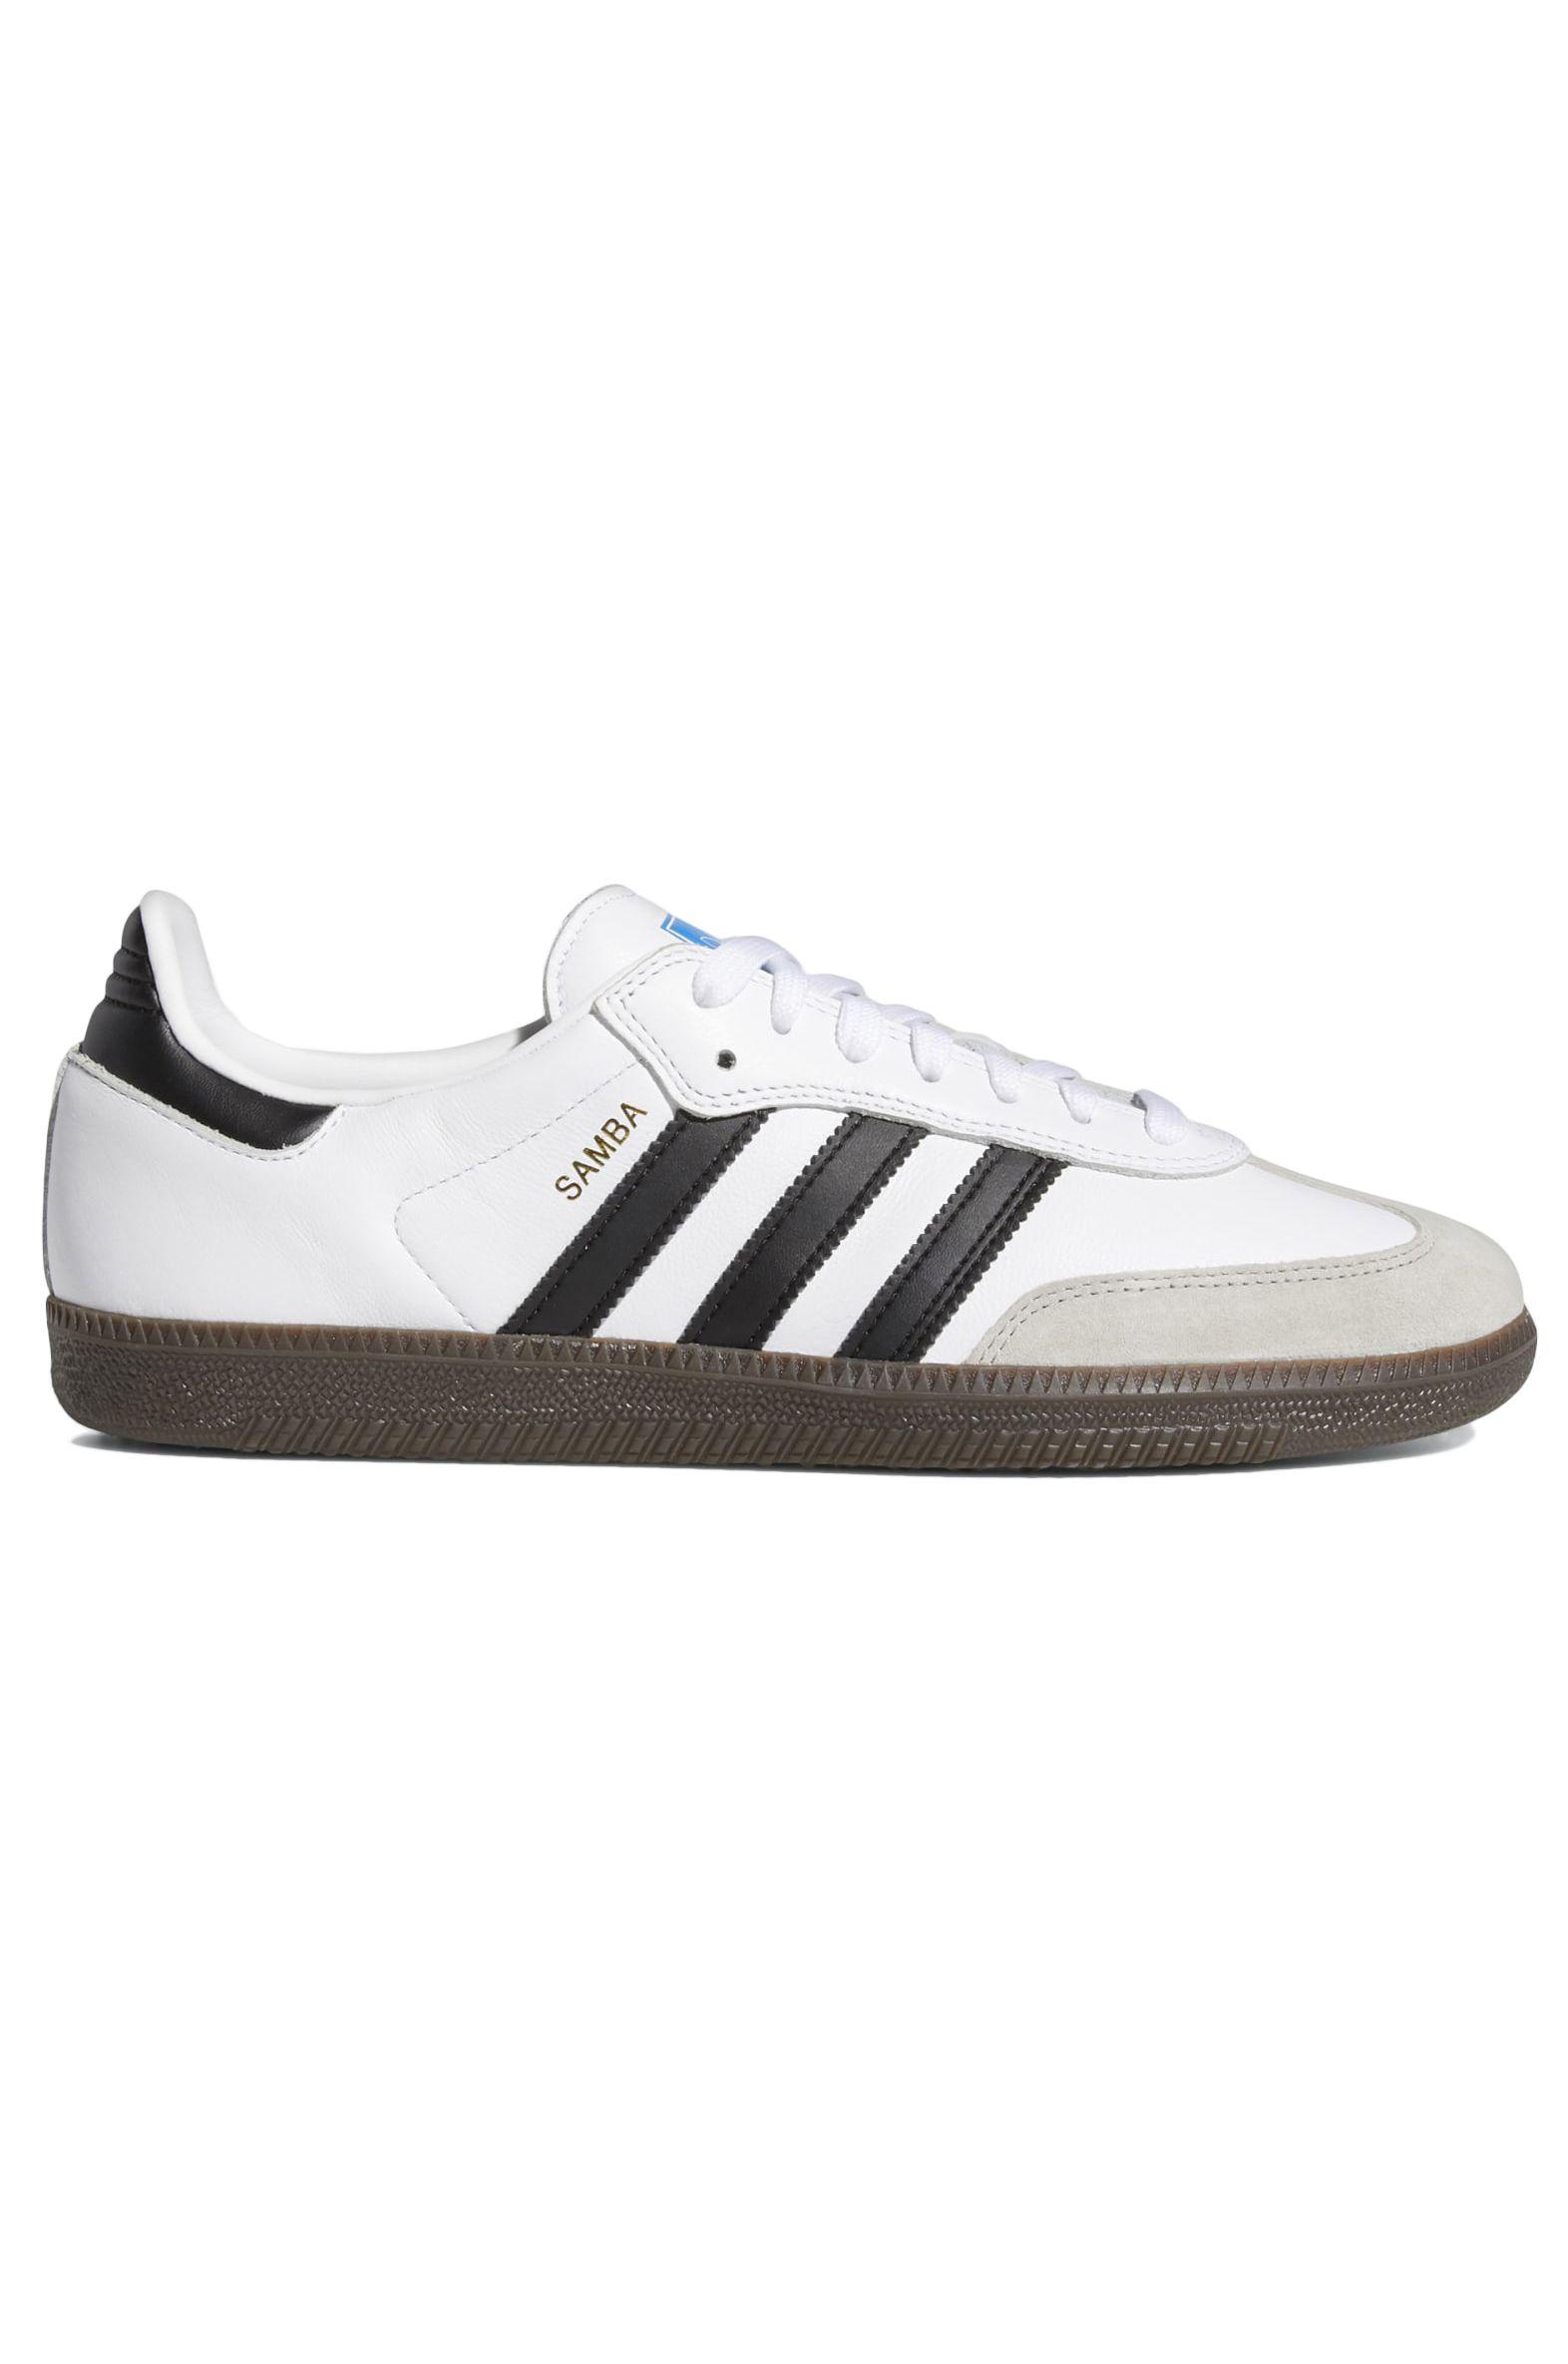 Adidas Shoes SAMBA ADV Ftwr White/Core Black/Gum5